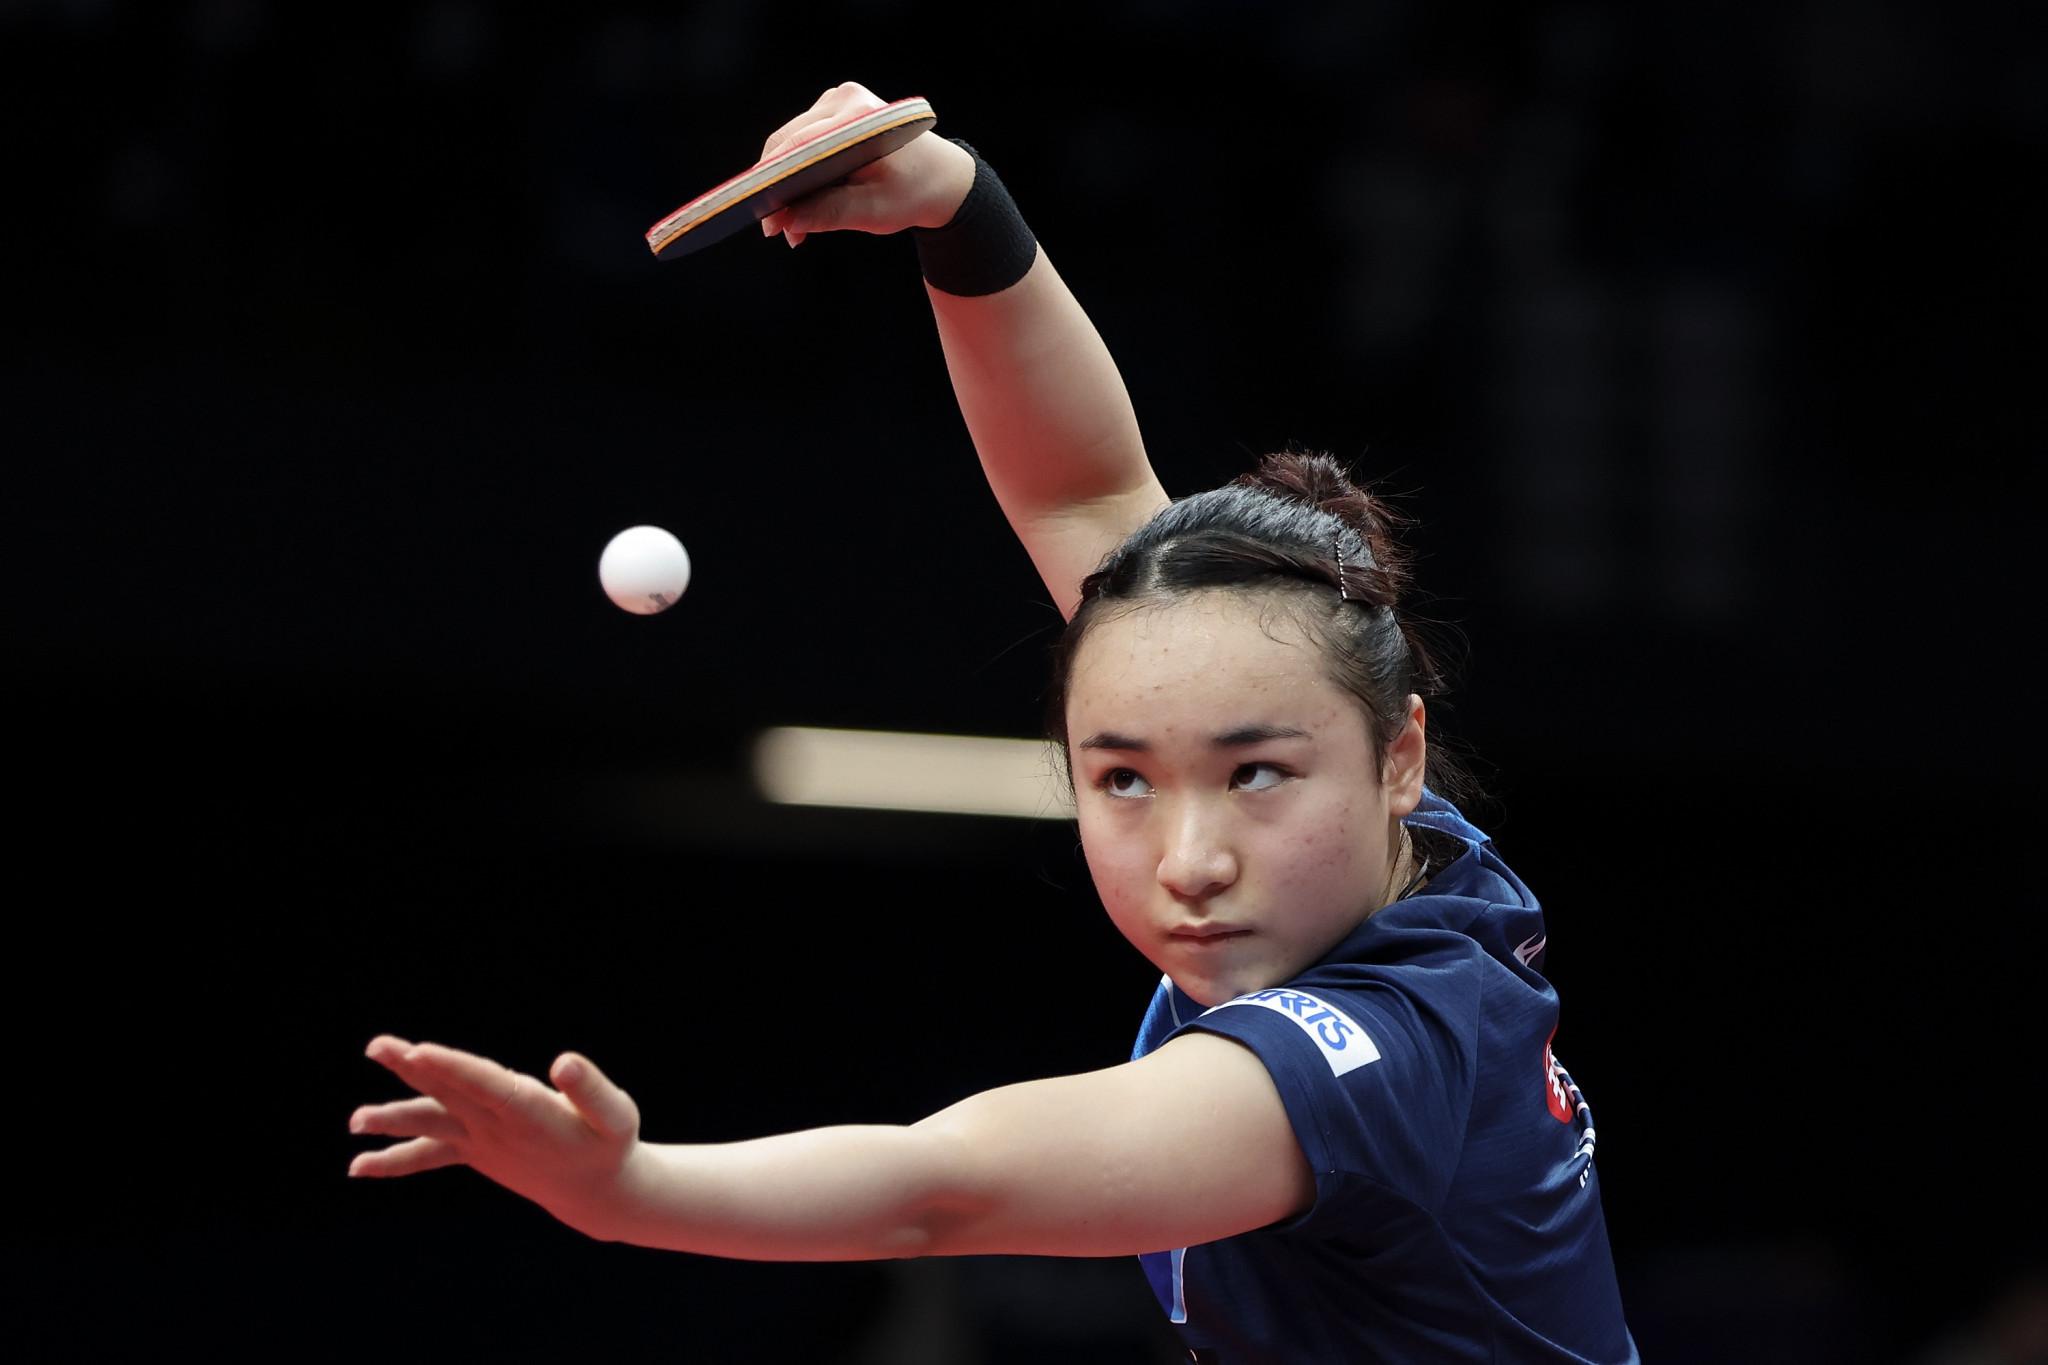 Japan joy as Harimoto and Ito win singles titles at WTT Star Contender in Doha